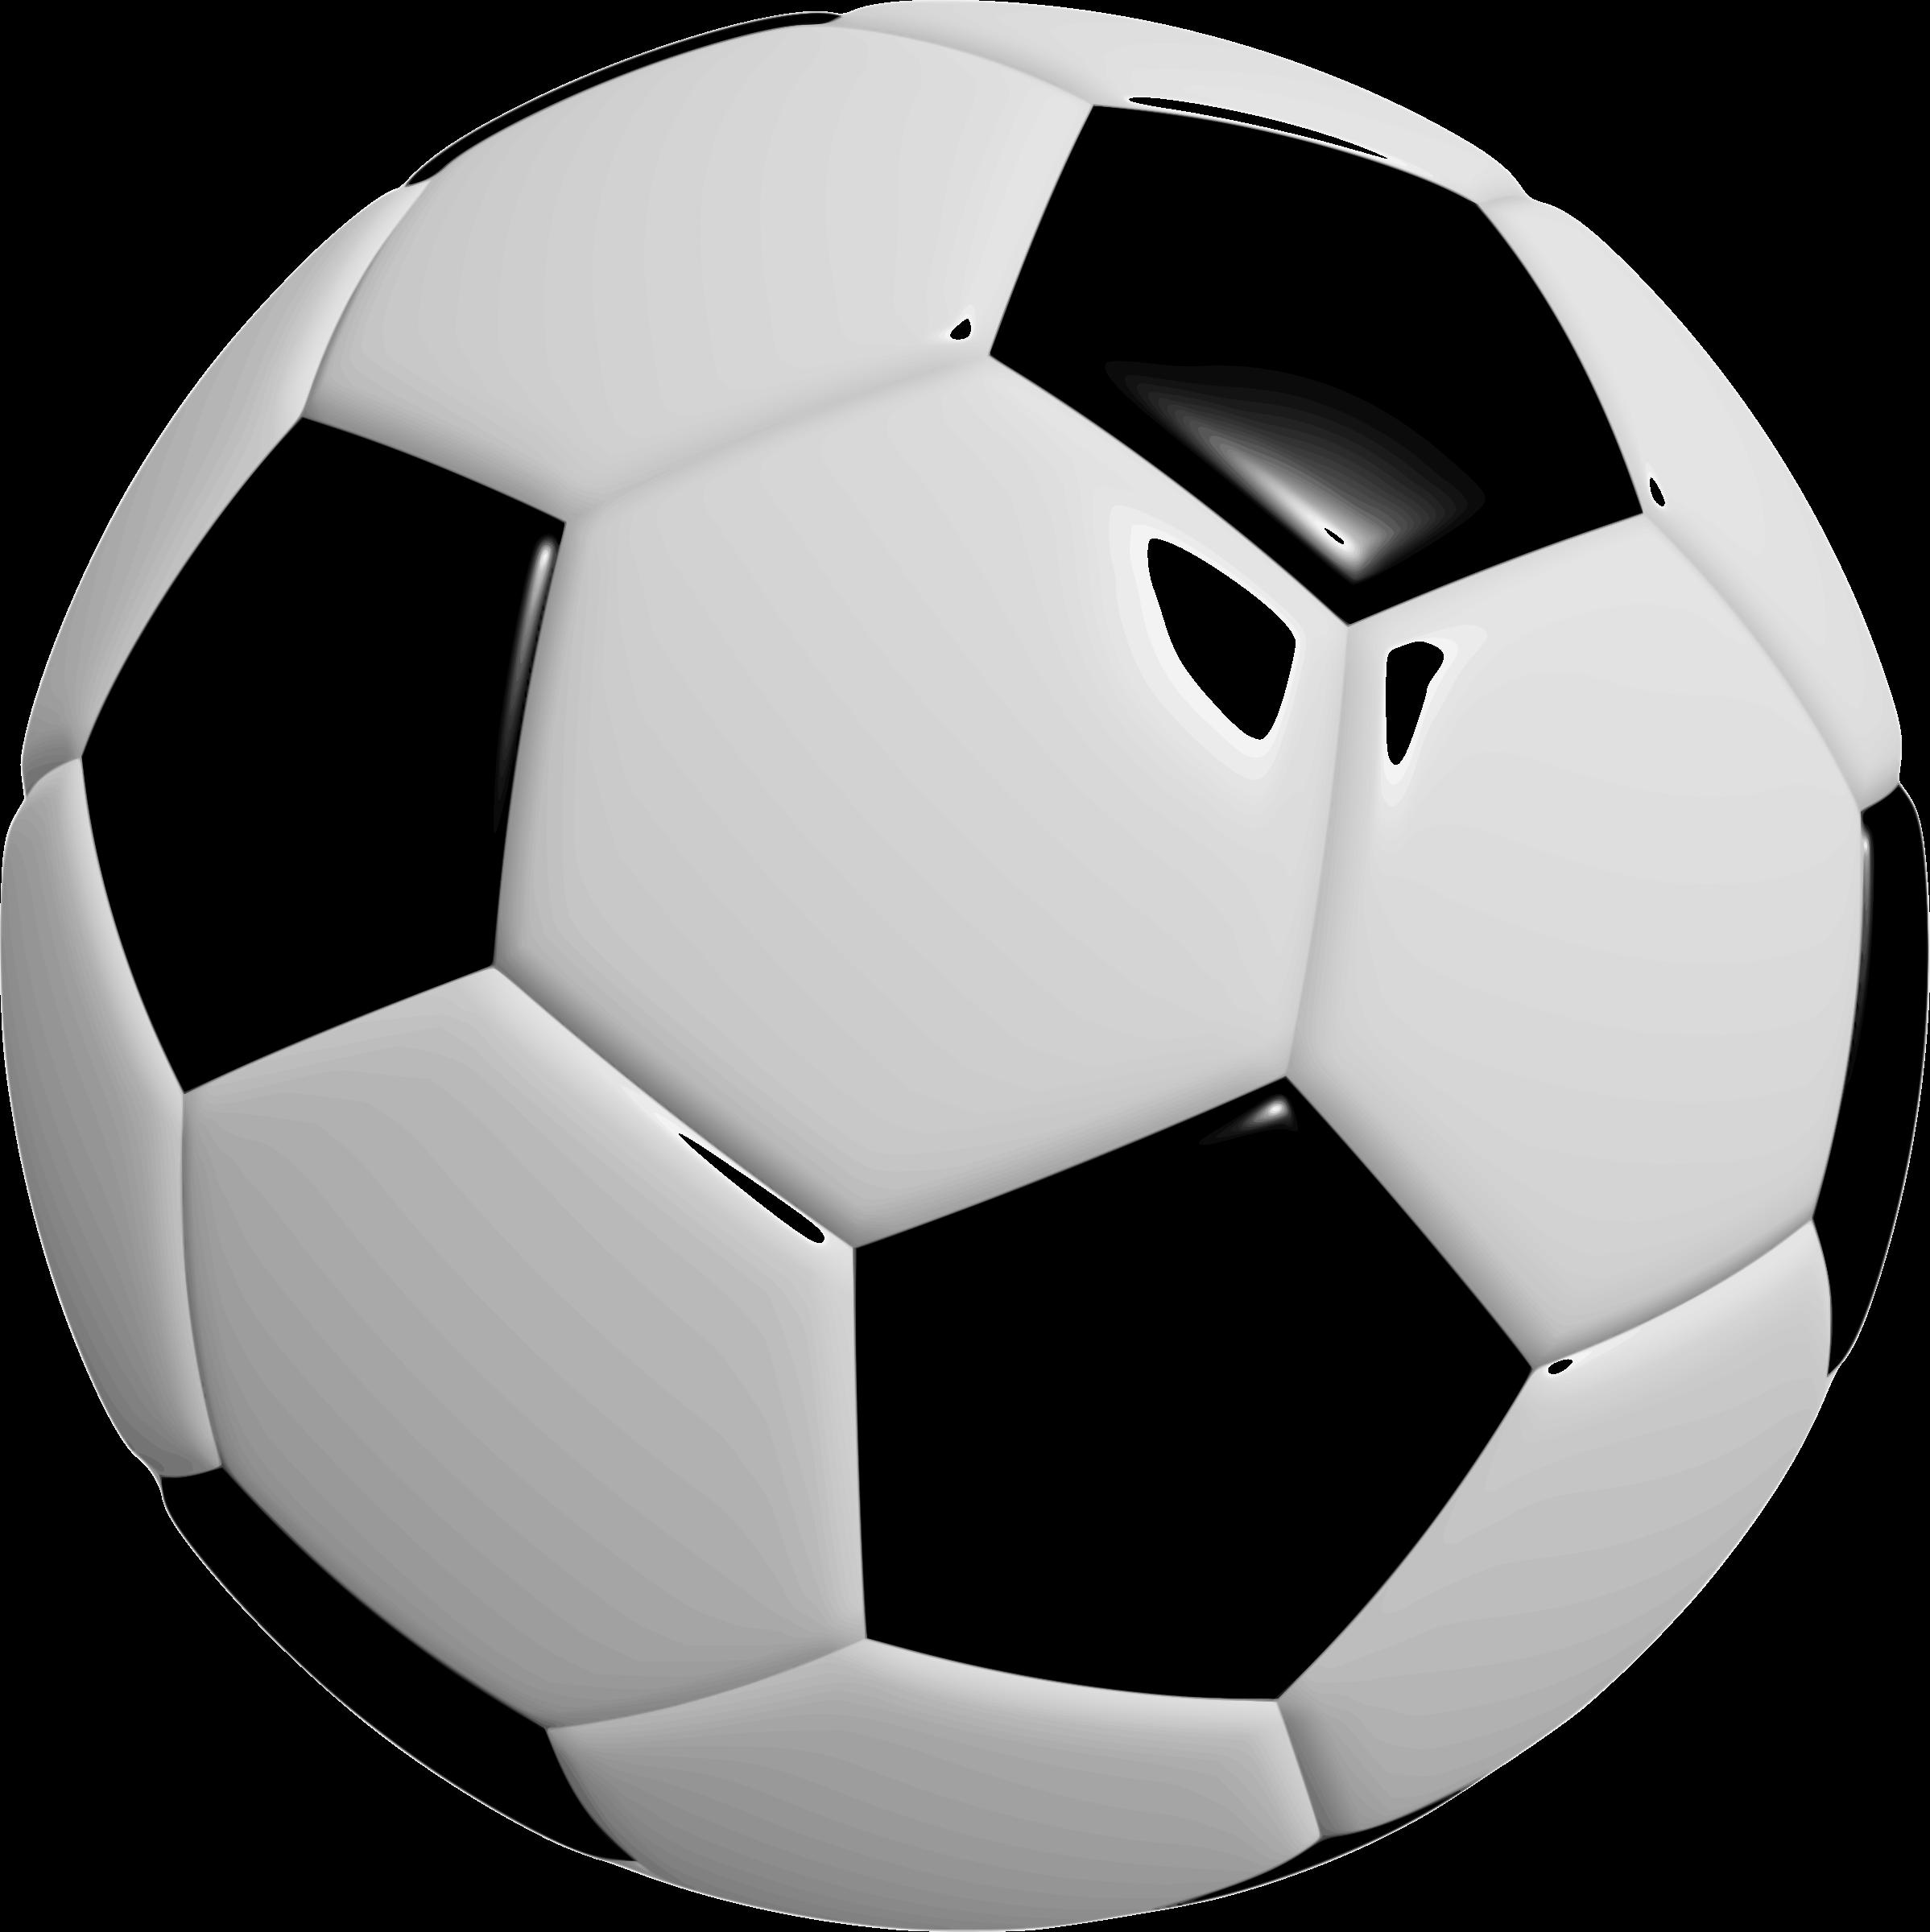 Football Adidas Brazuca Goalkeeper.